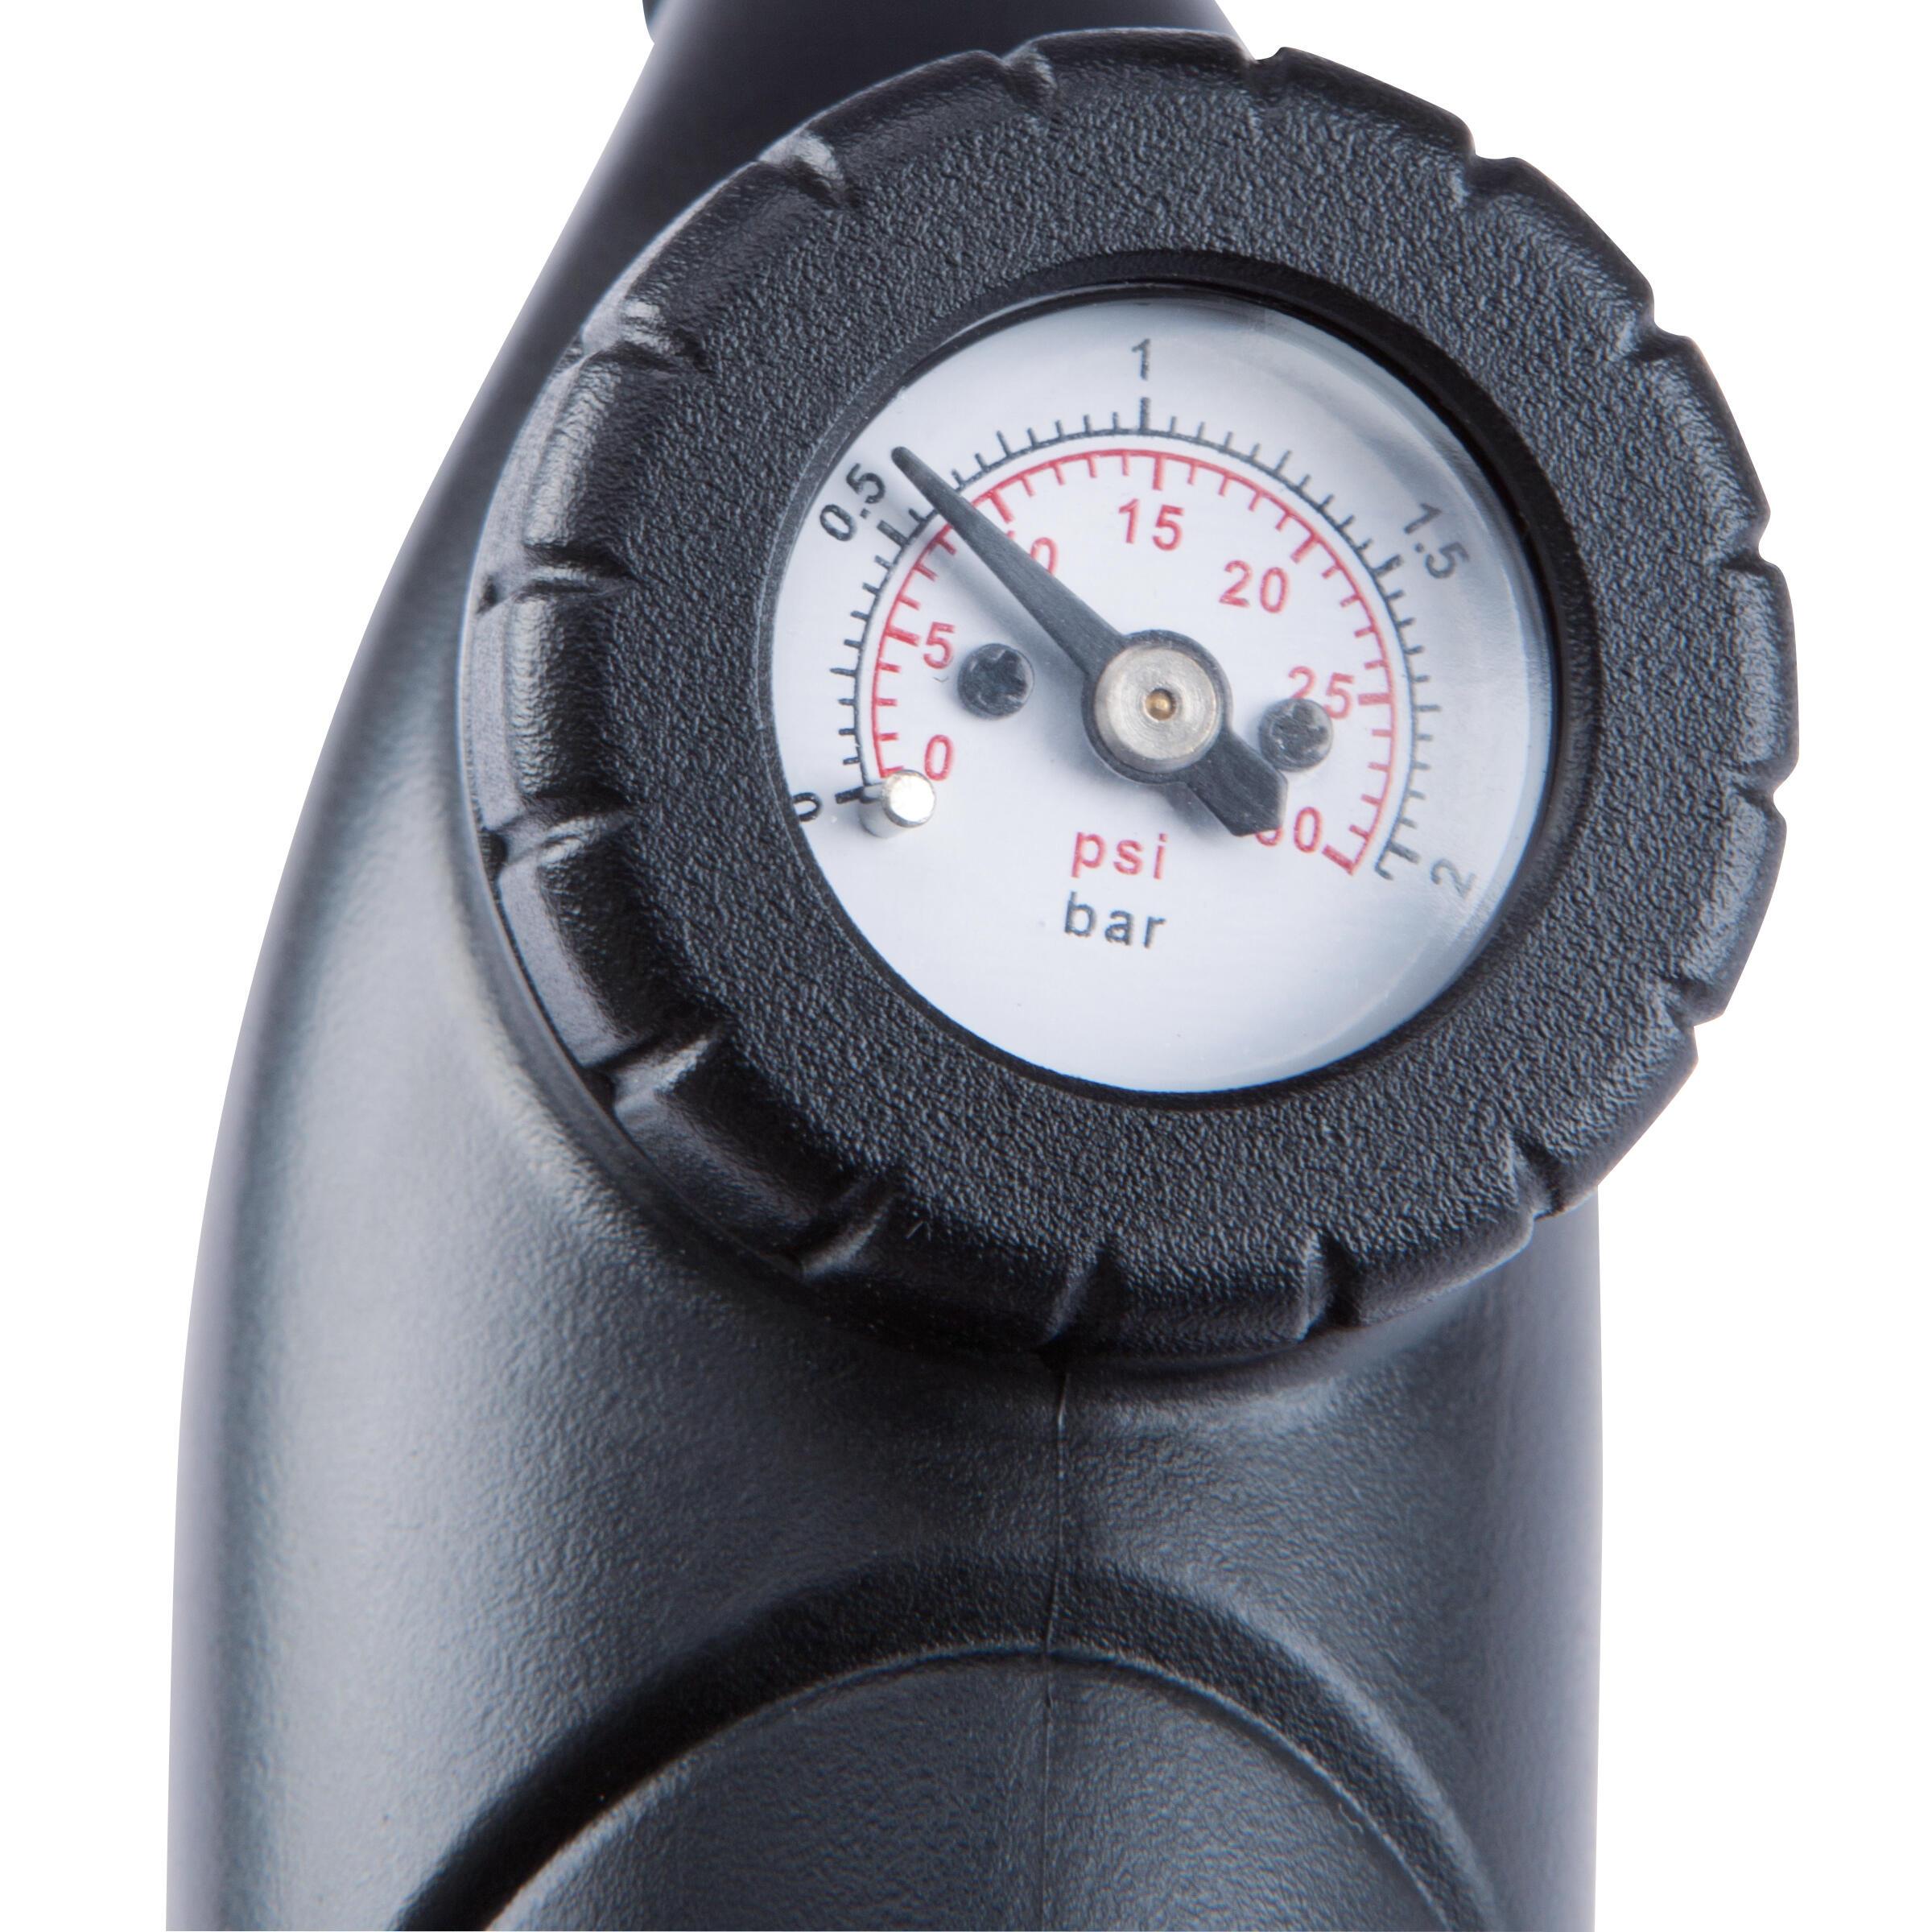 Double Action Pump / Pressure Gauge with hose extension - Black